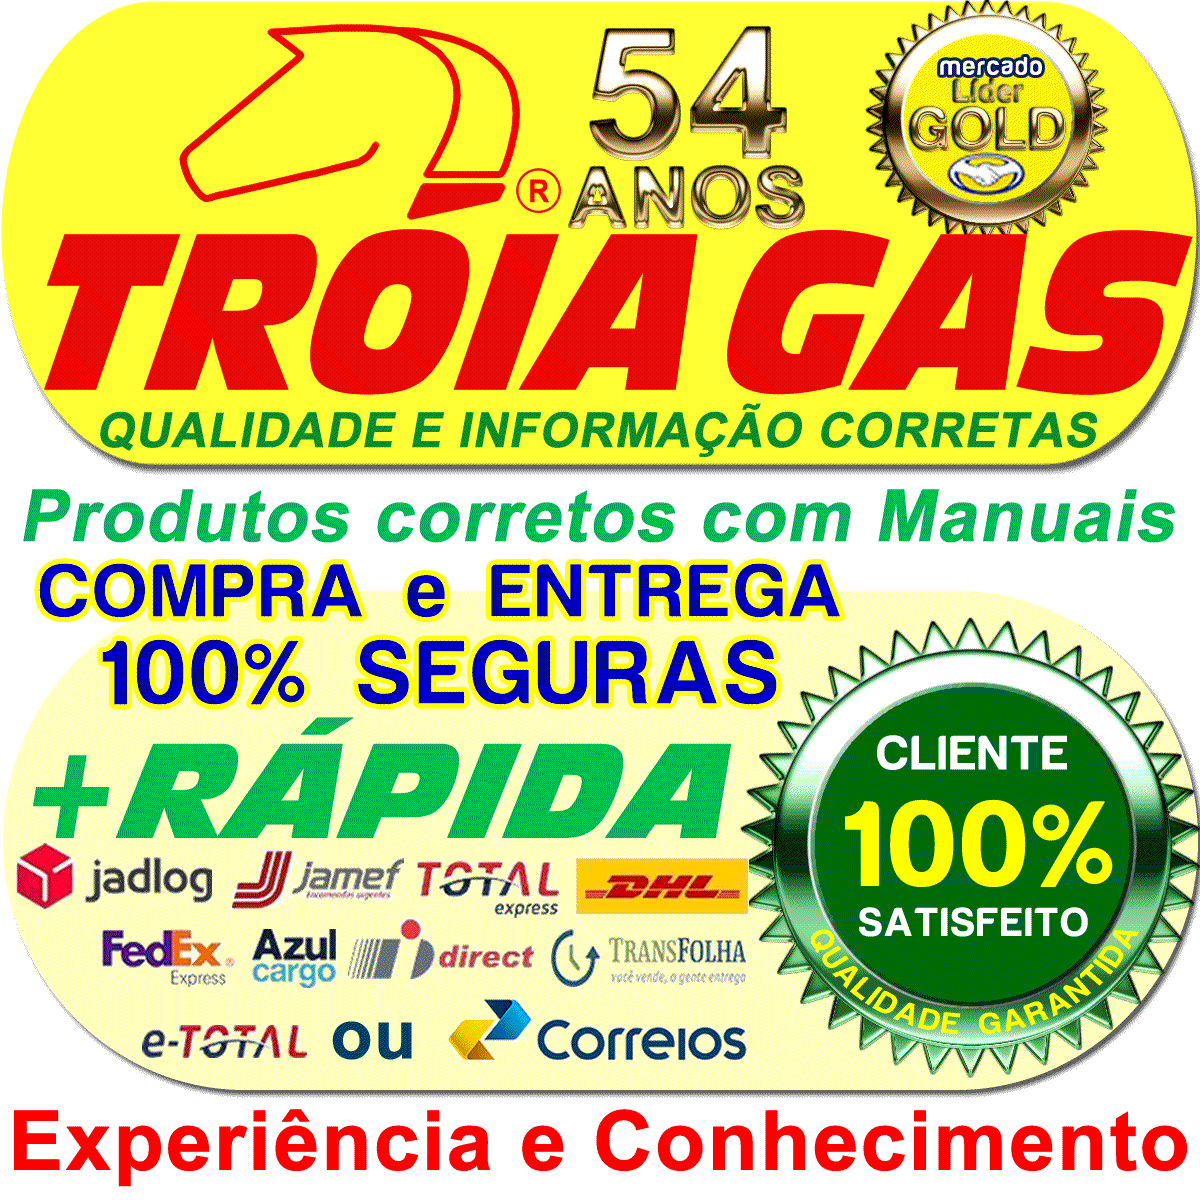 Parafuso Sextavado 10x70 mm 8.8 MA Rosca Inteira 70mm